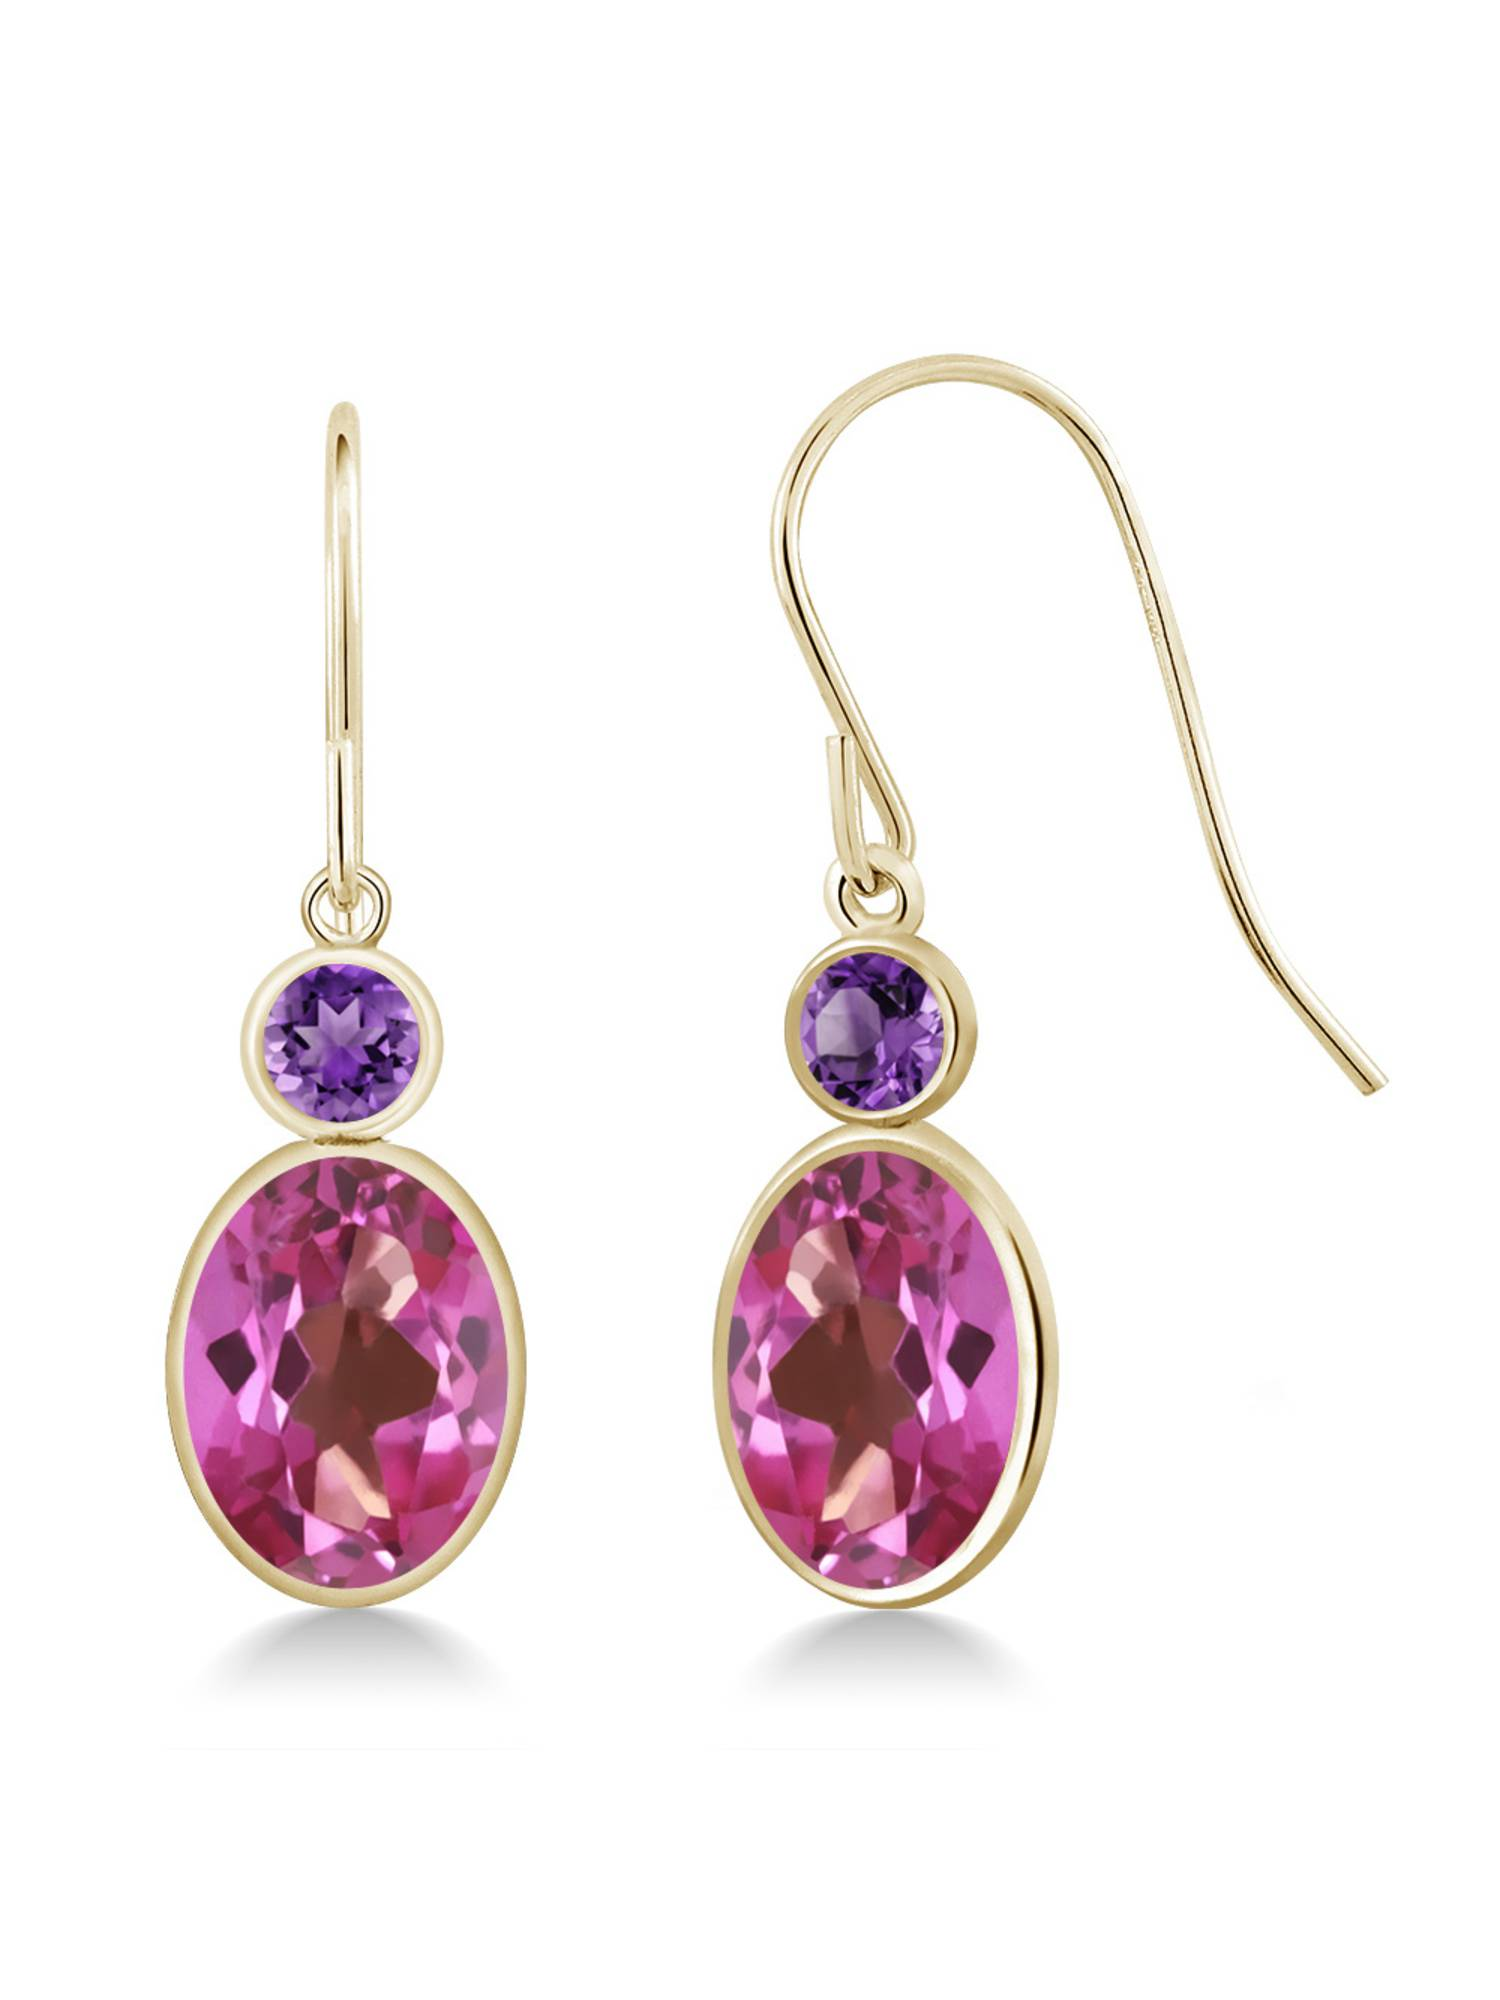 3.20 Ct Oval Pink Mystic Topaz Purple Amethyst 14K Yellow Gold Earrings by